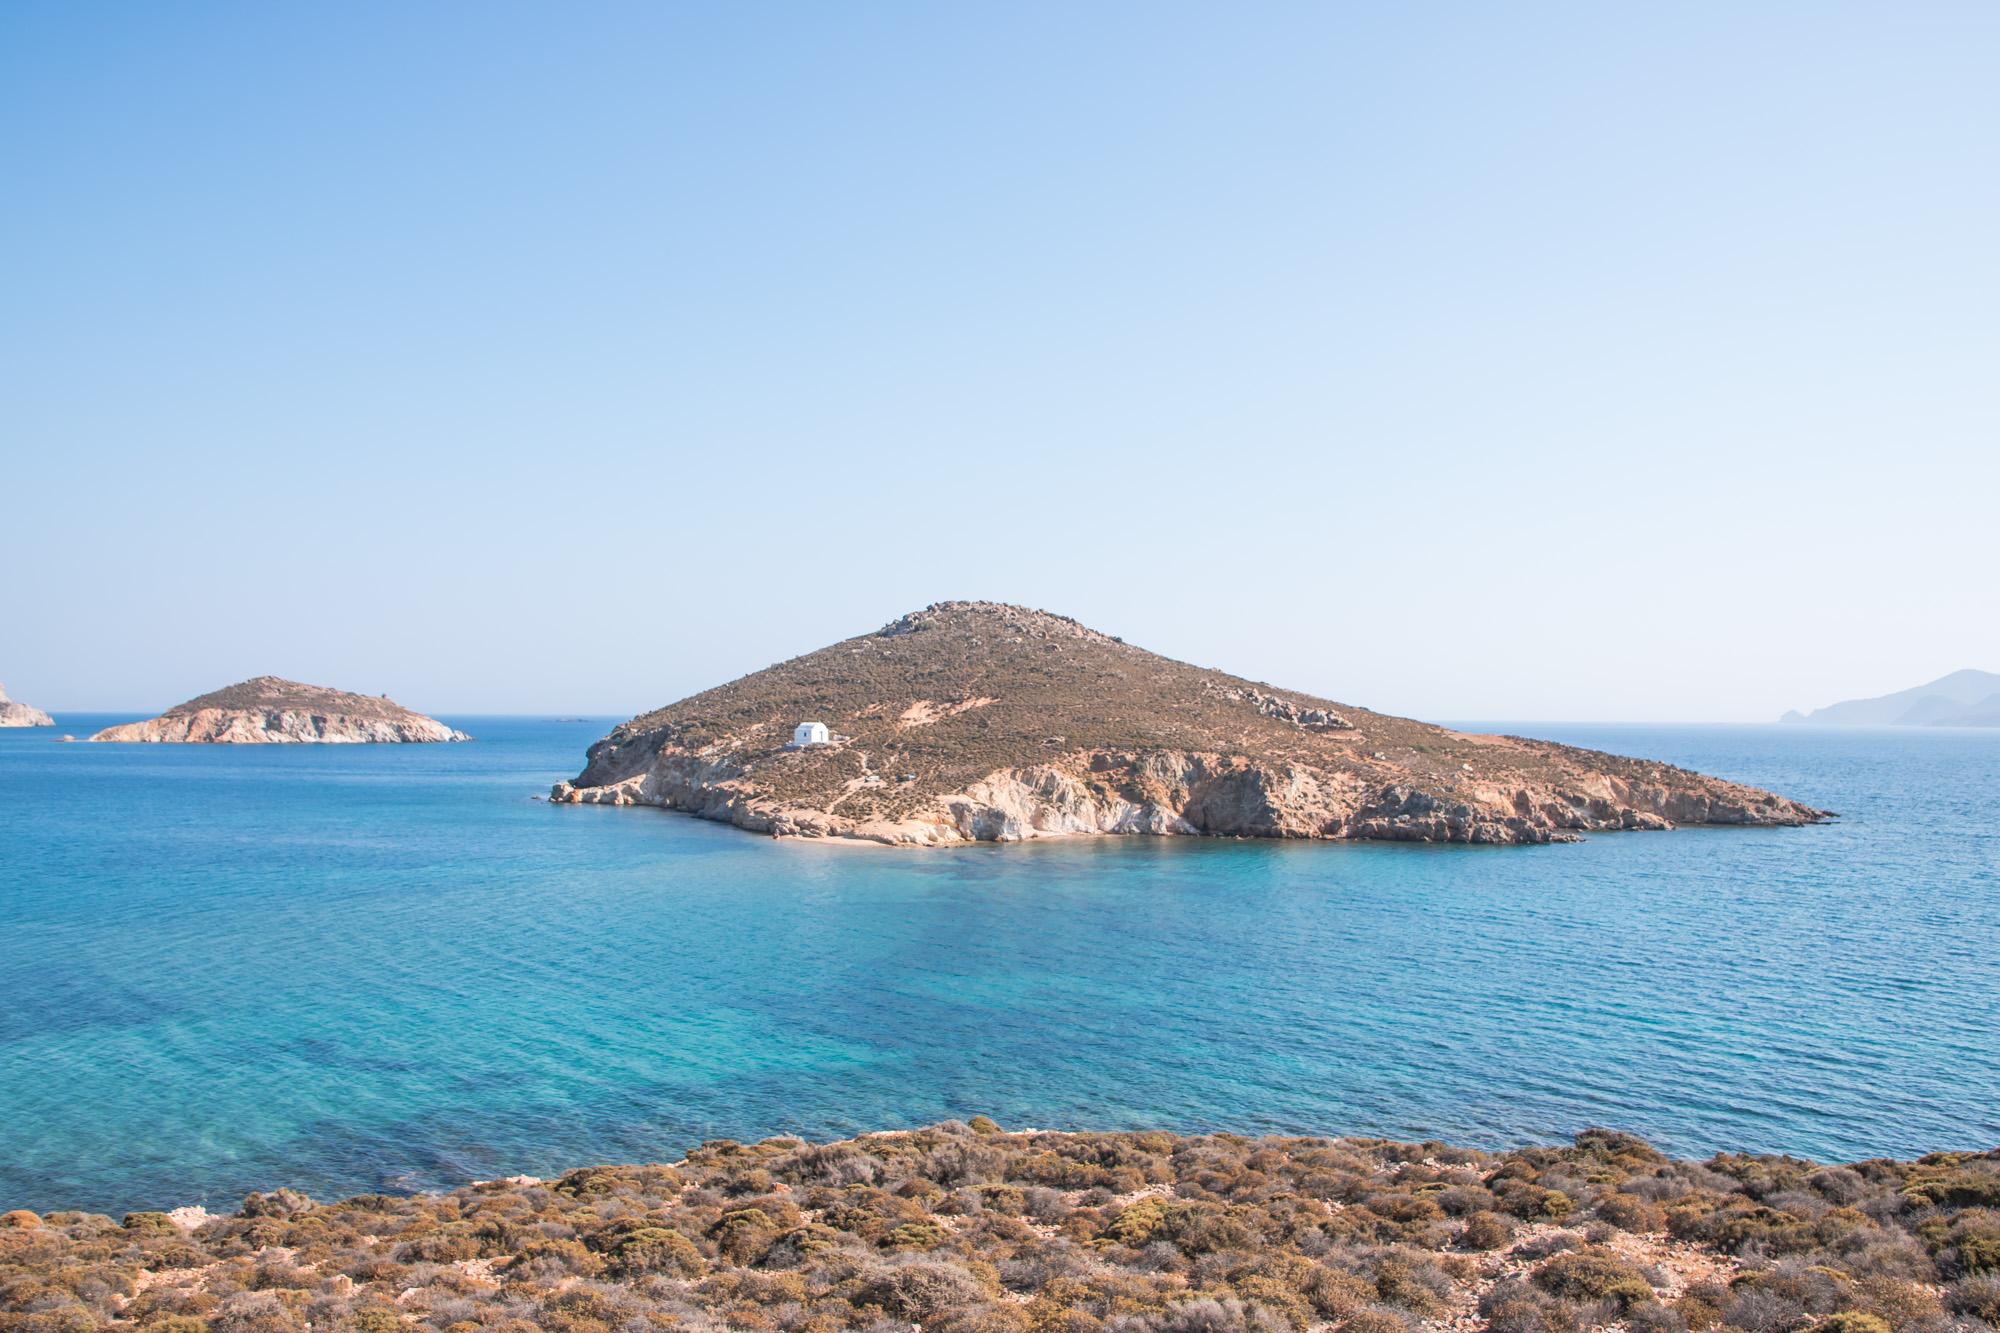 Agios Georgios Insel und Kapelle gegenüber dem Strand Livasi Geranou